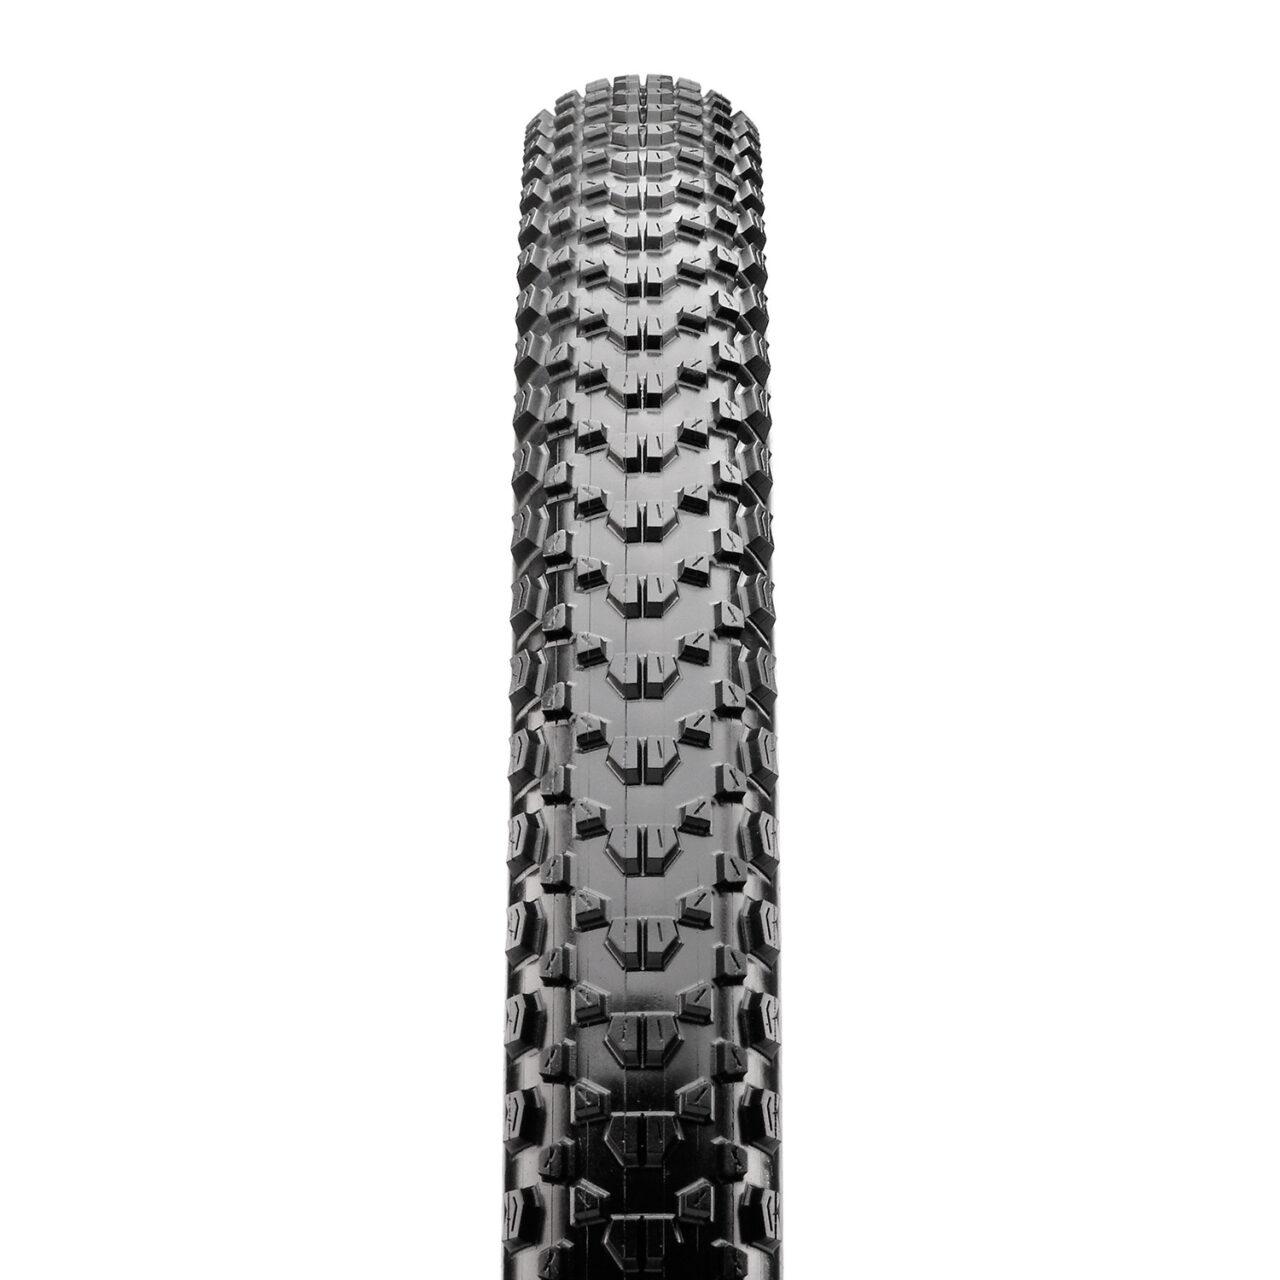 Maxxis Ikon bicycle tire tread